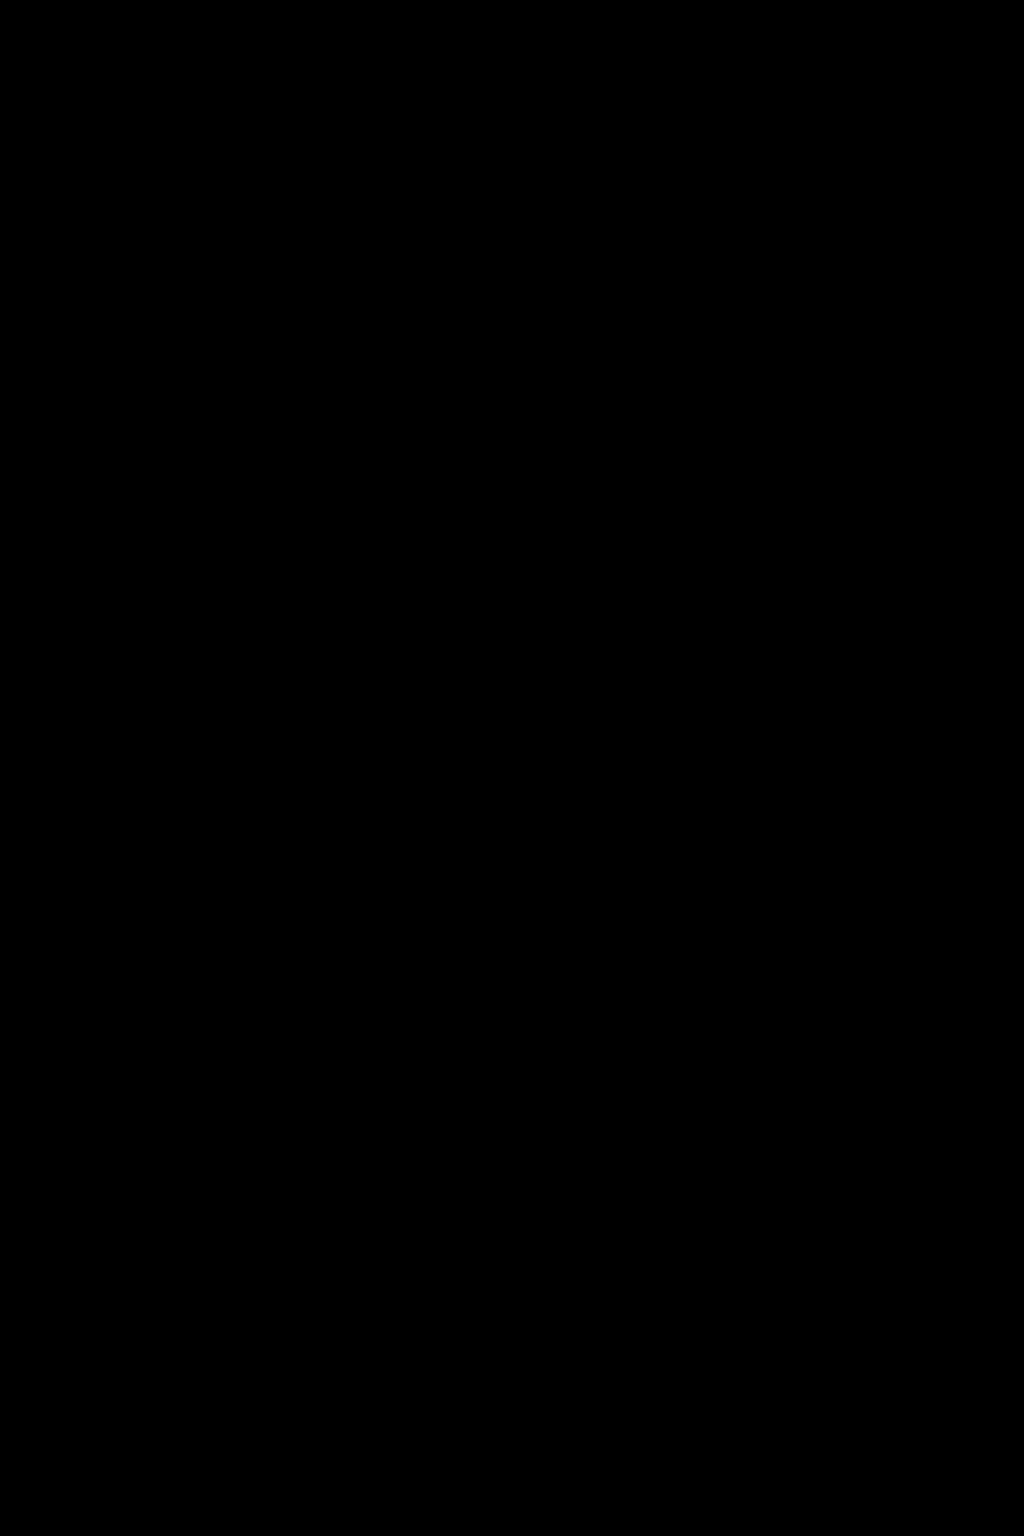 2_3c6c4f1f-fc5e-4b01-9853-dd0f2e9f4e19_EAN3073